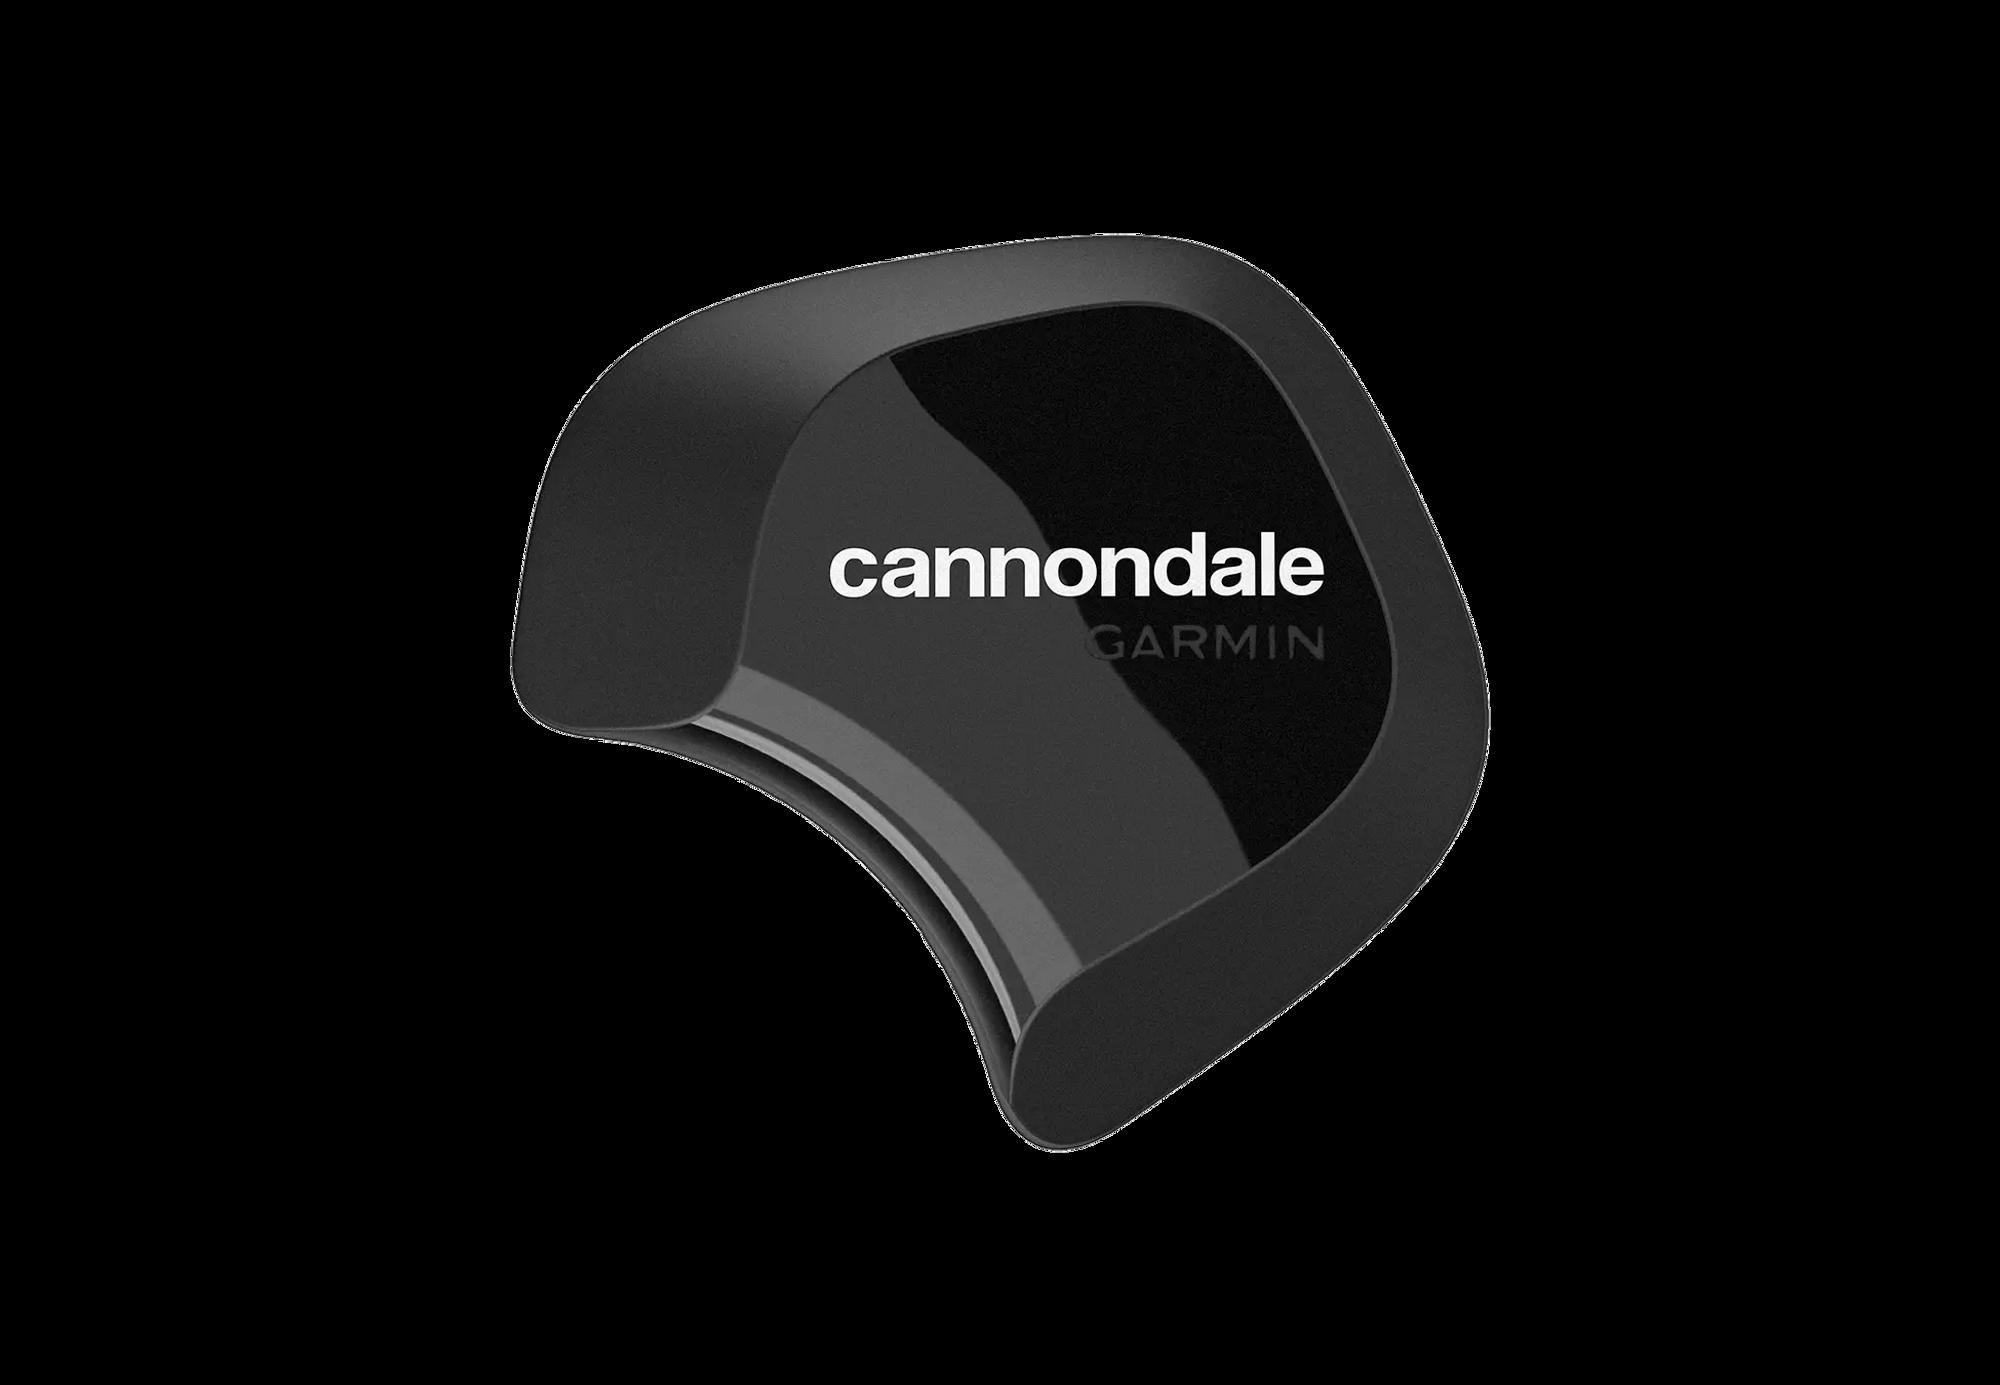 Cannondale Wheel Sensor Detail Image